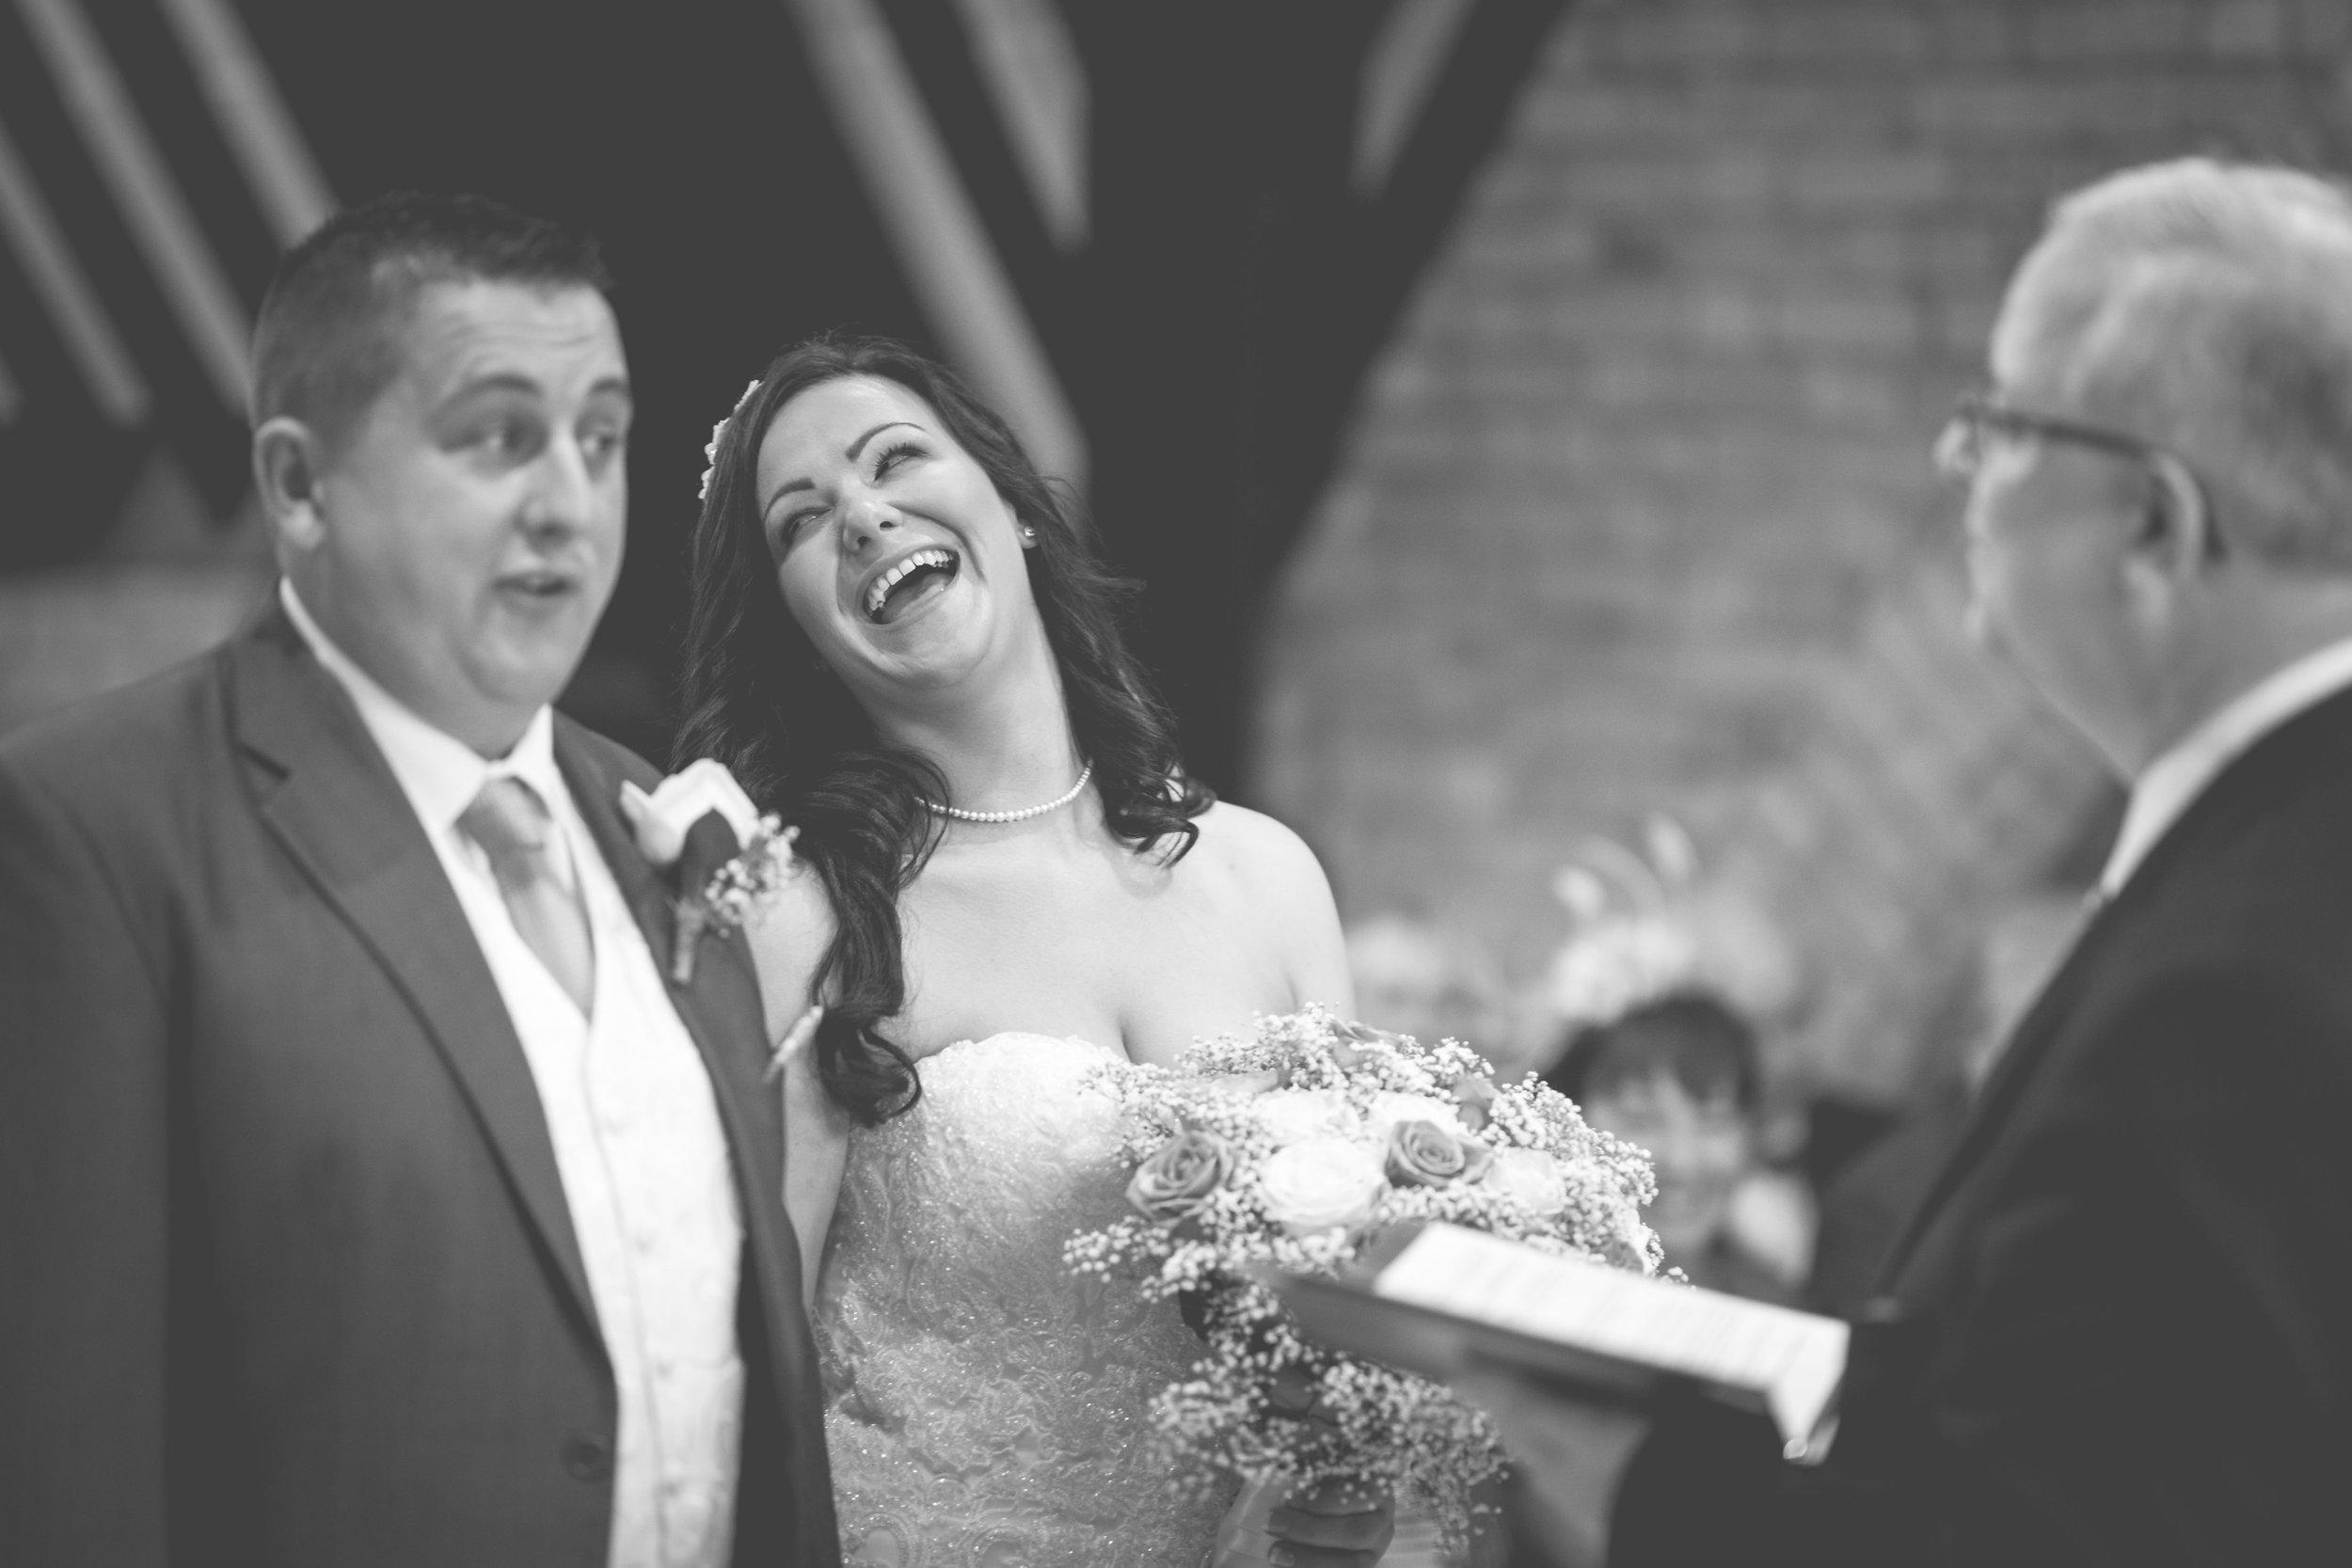 Helena & Terence - Ceremony-44.jpg